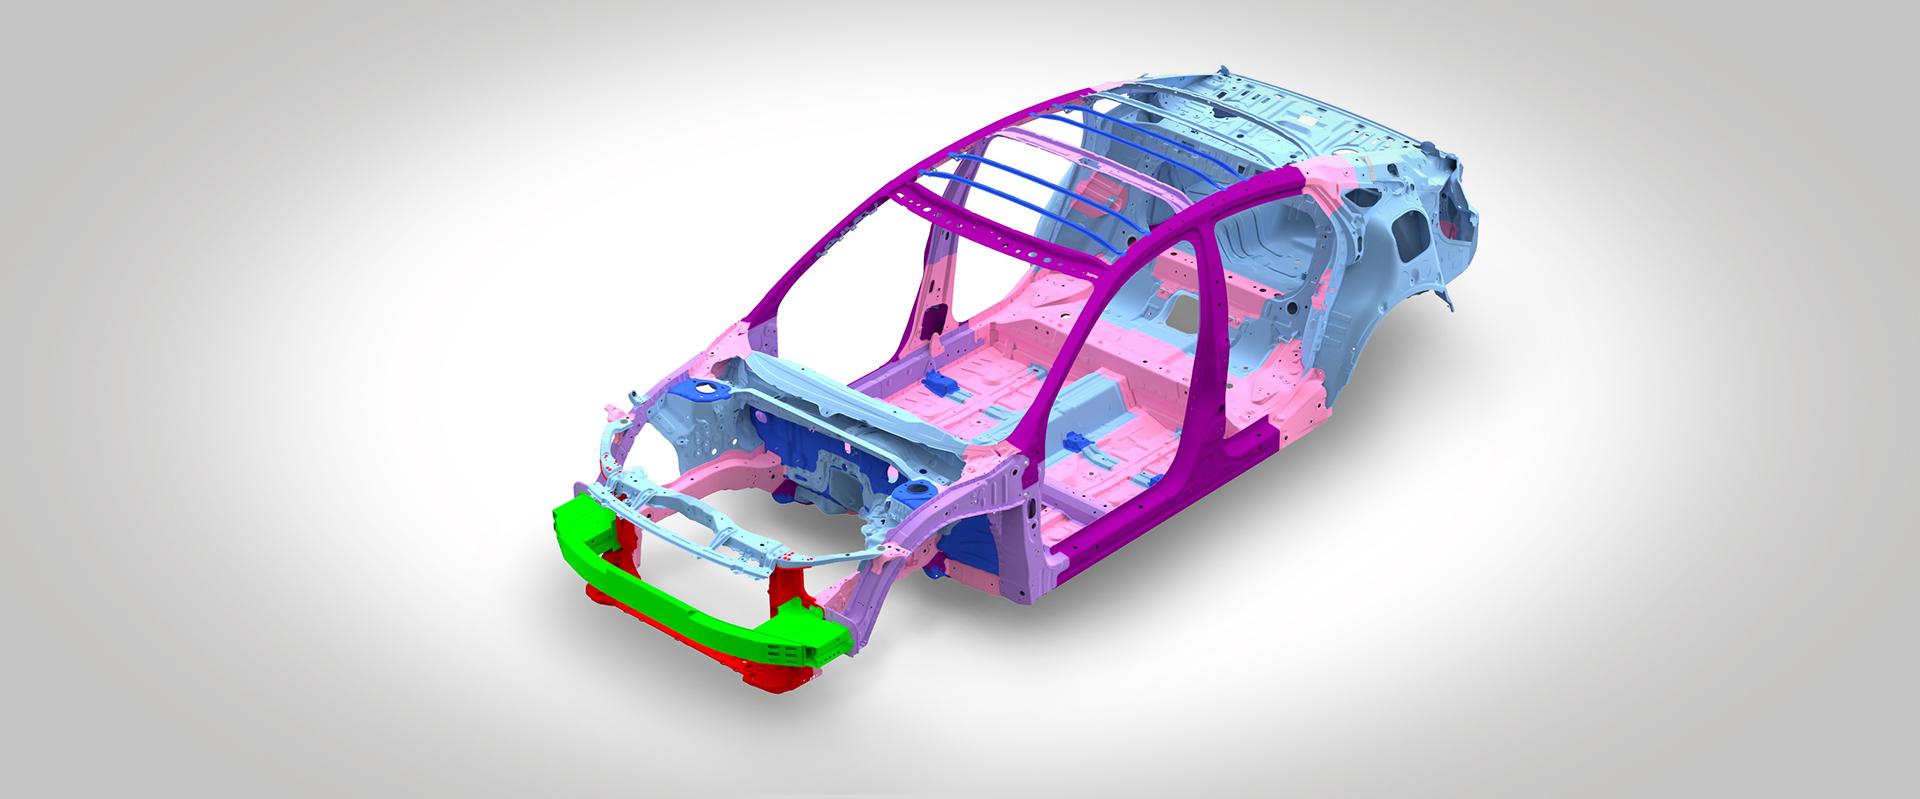 2016 Honda Civic ACE Body Structure